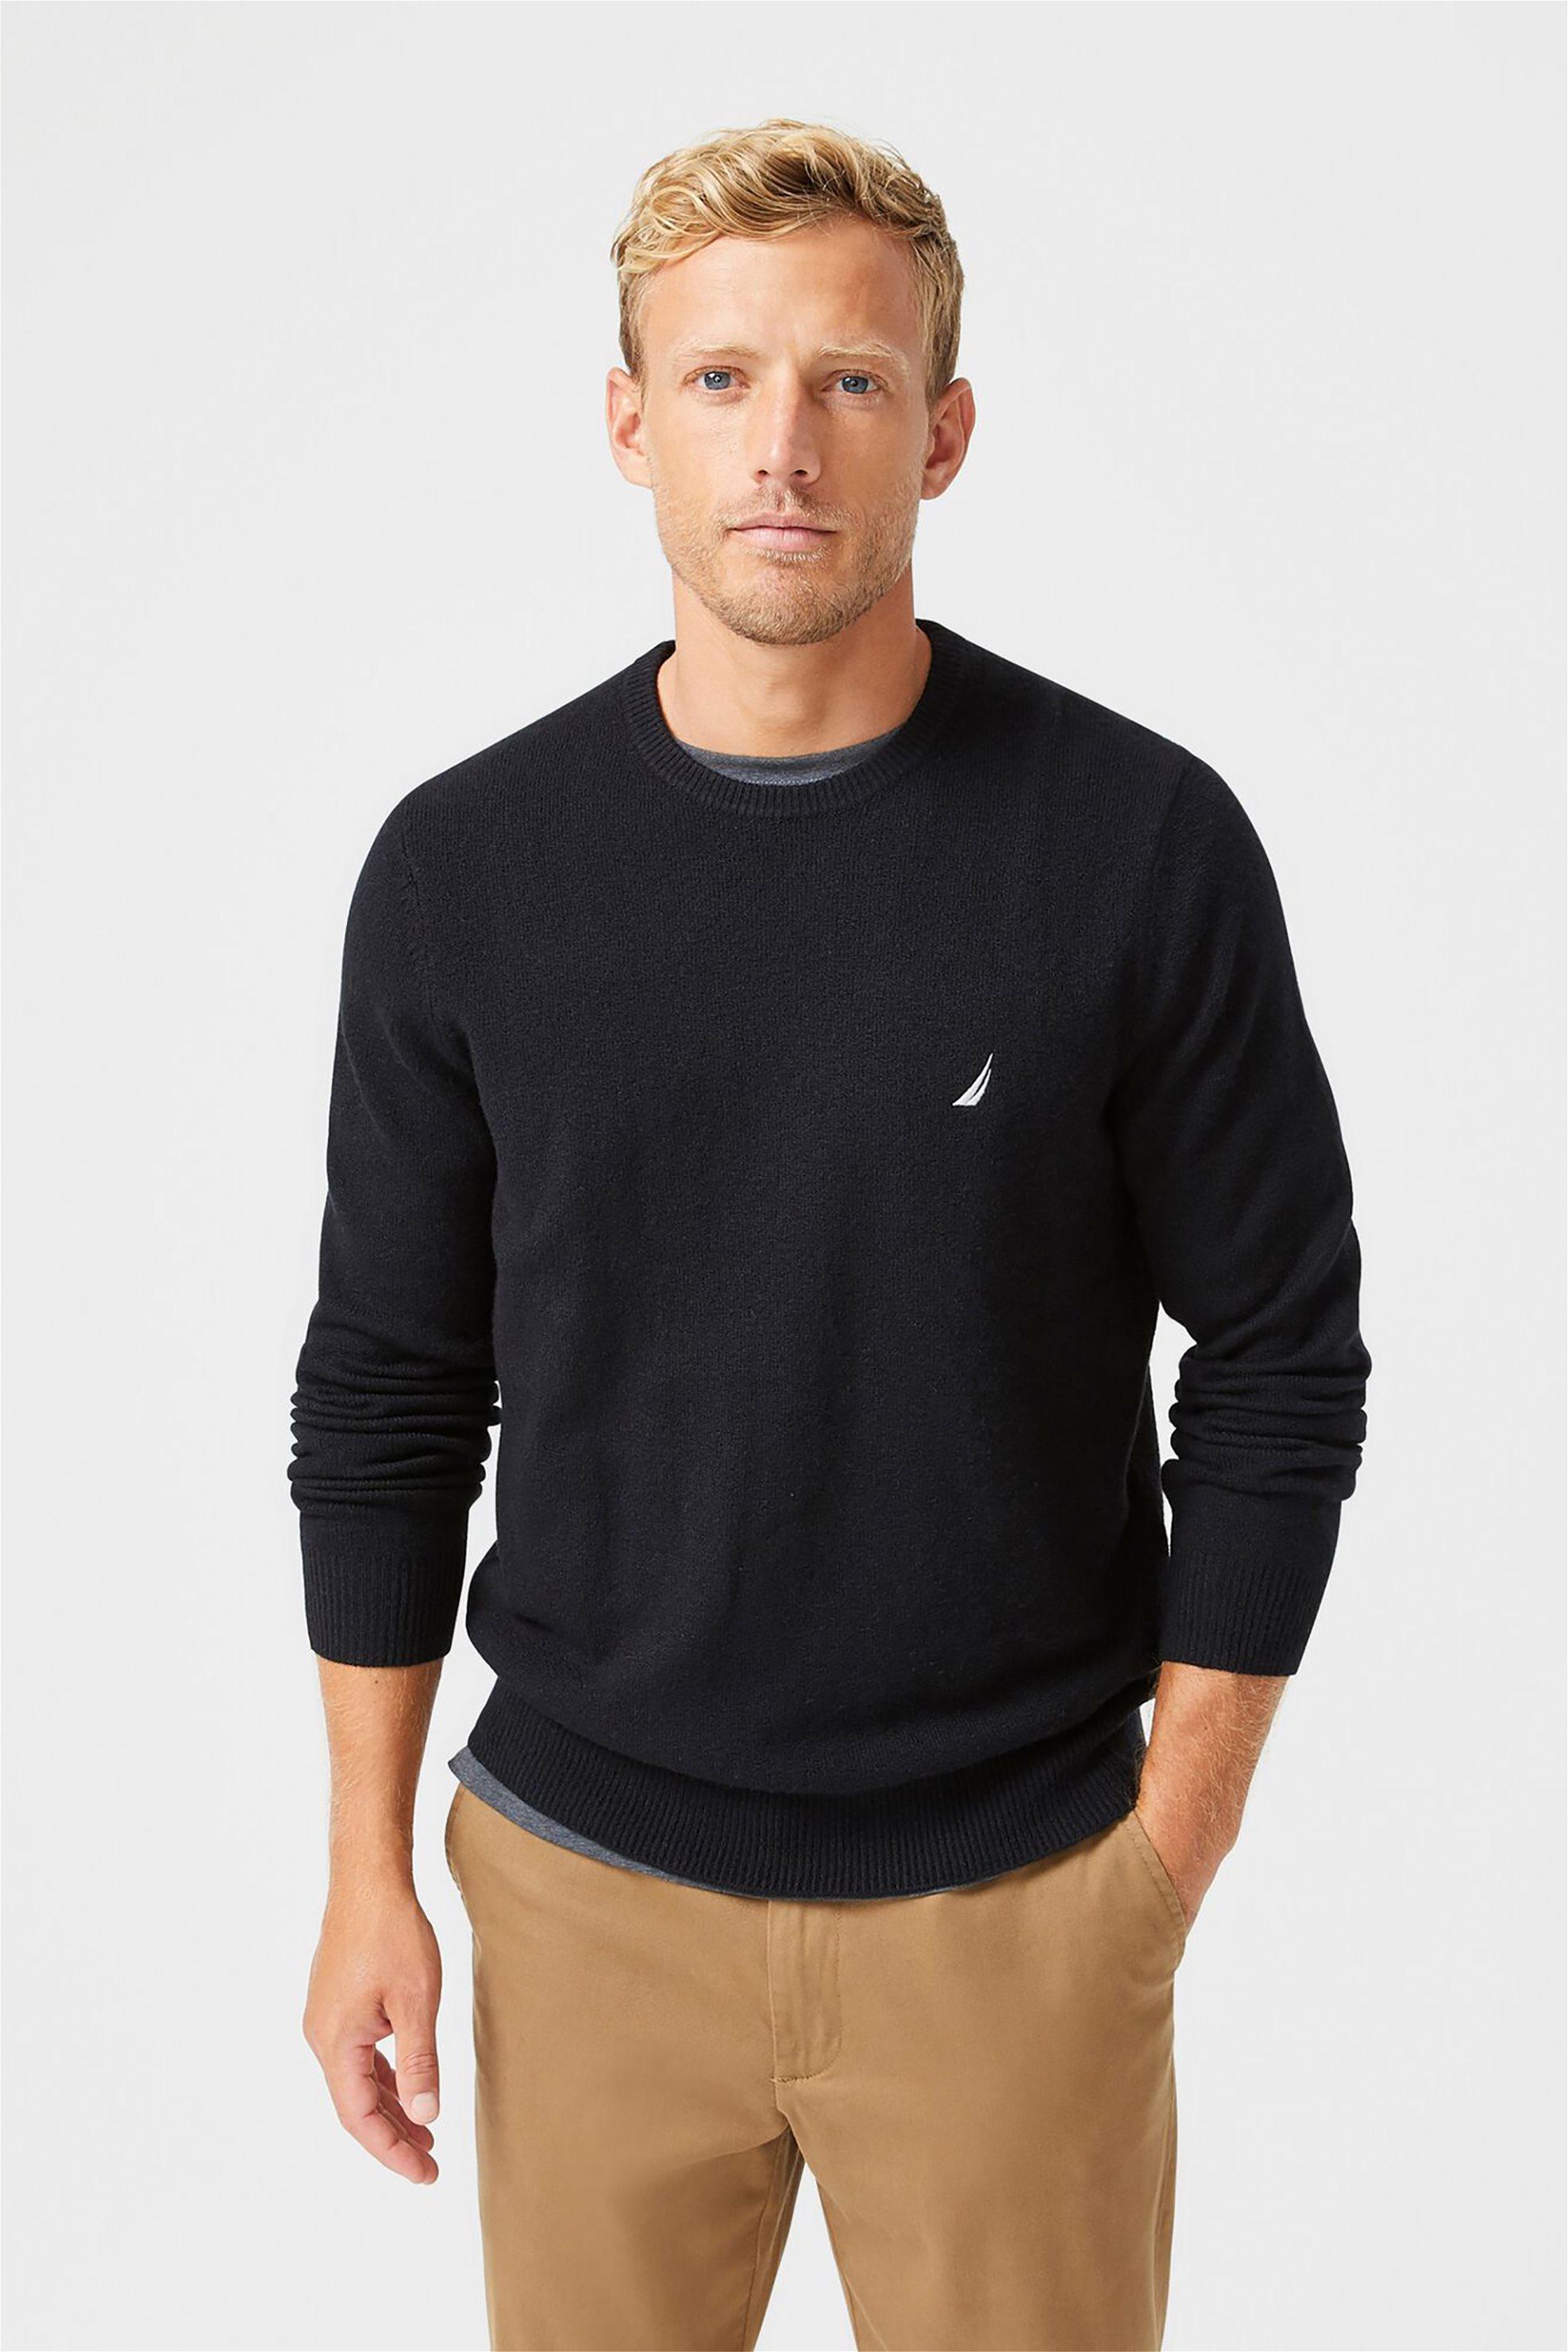 Nautica ανδρικό πουλόβερ μονόχρωμο με στρογγυλή λαιμόκοψη - S03100 - Μαύρο